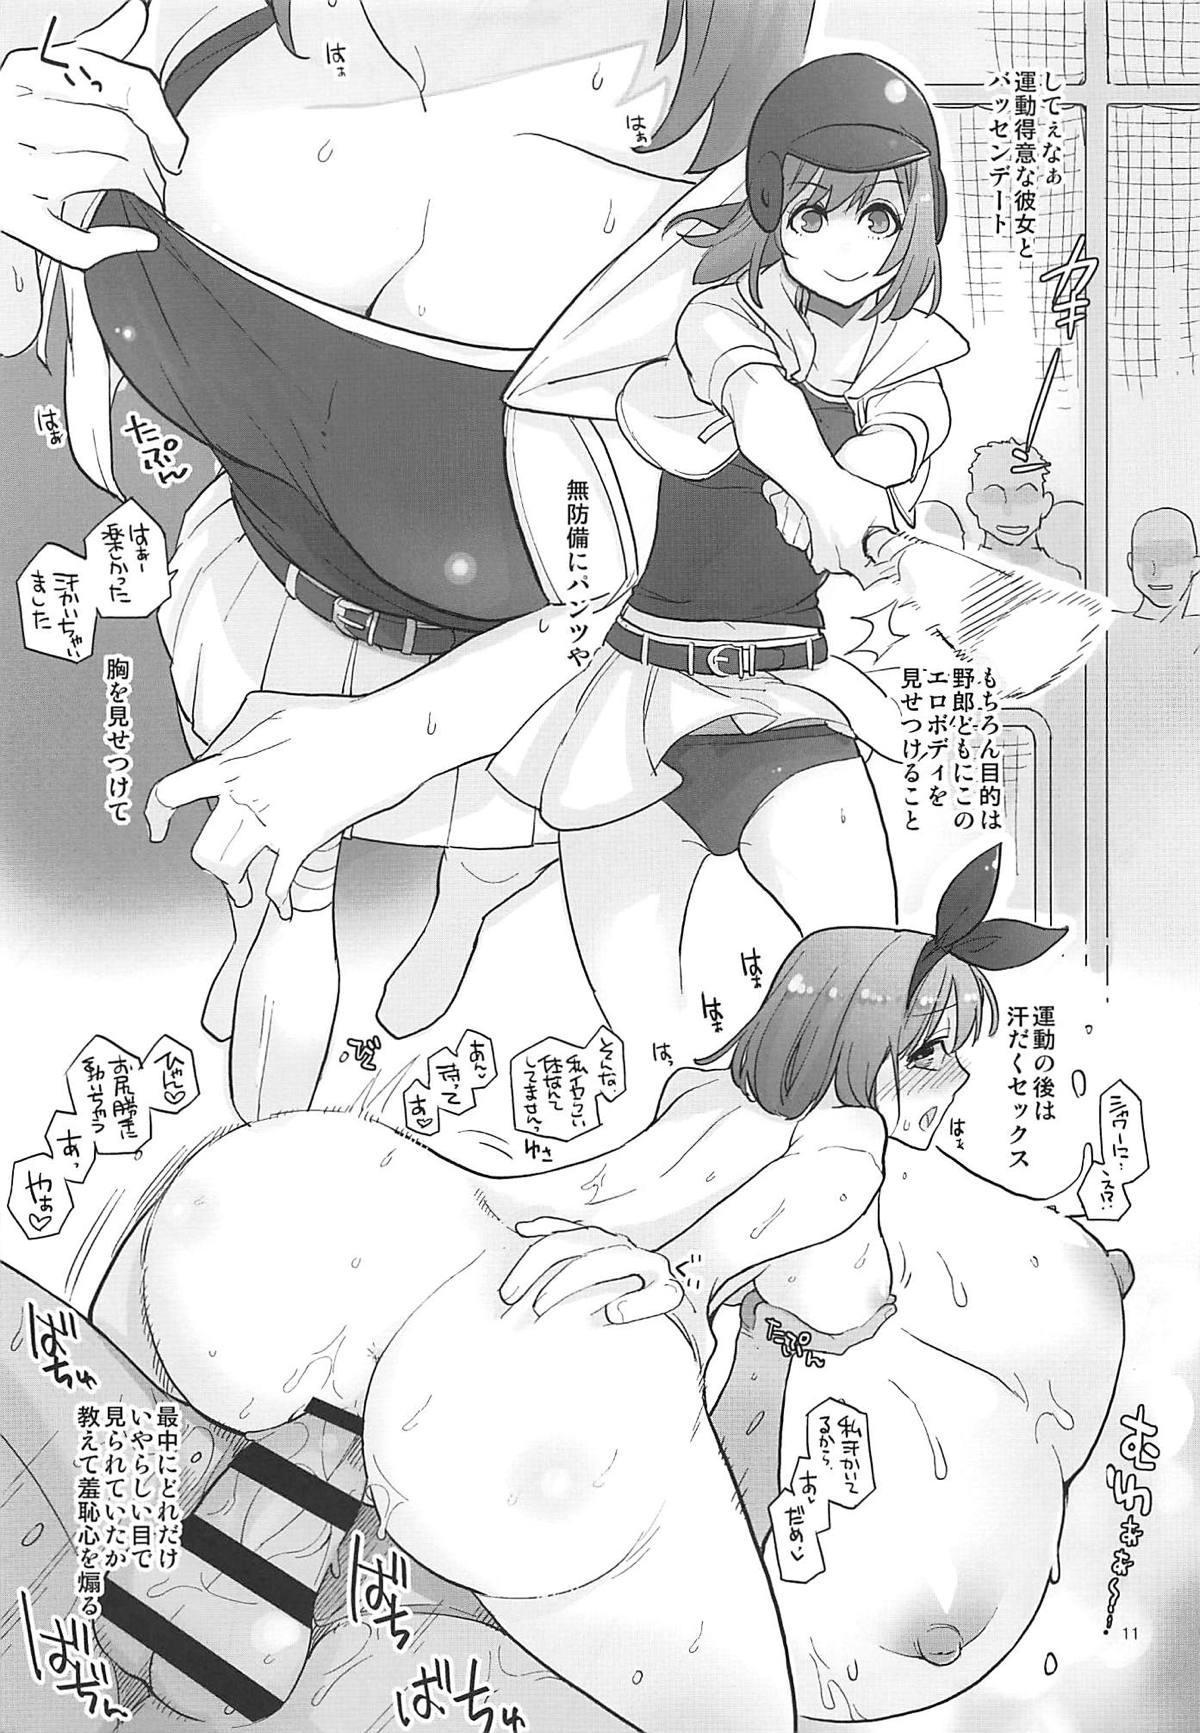 Yotsuba, Pants o Kai ni Iku 9